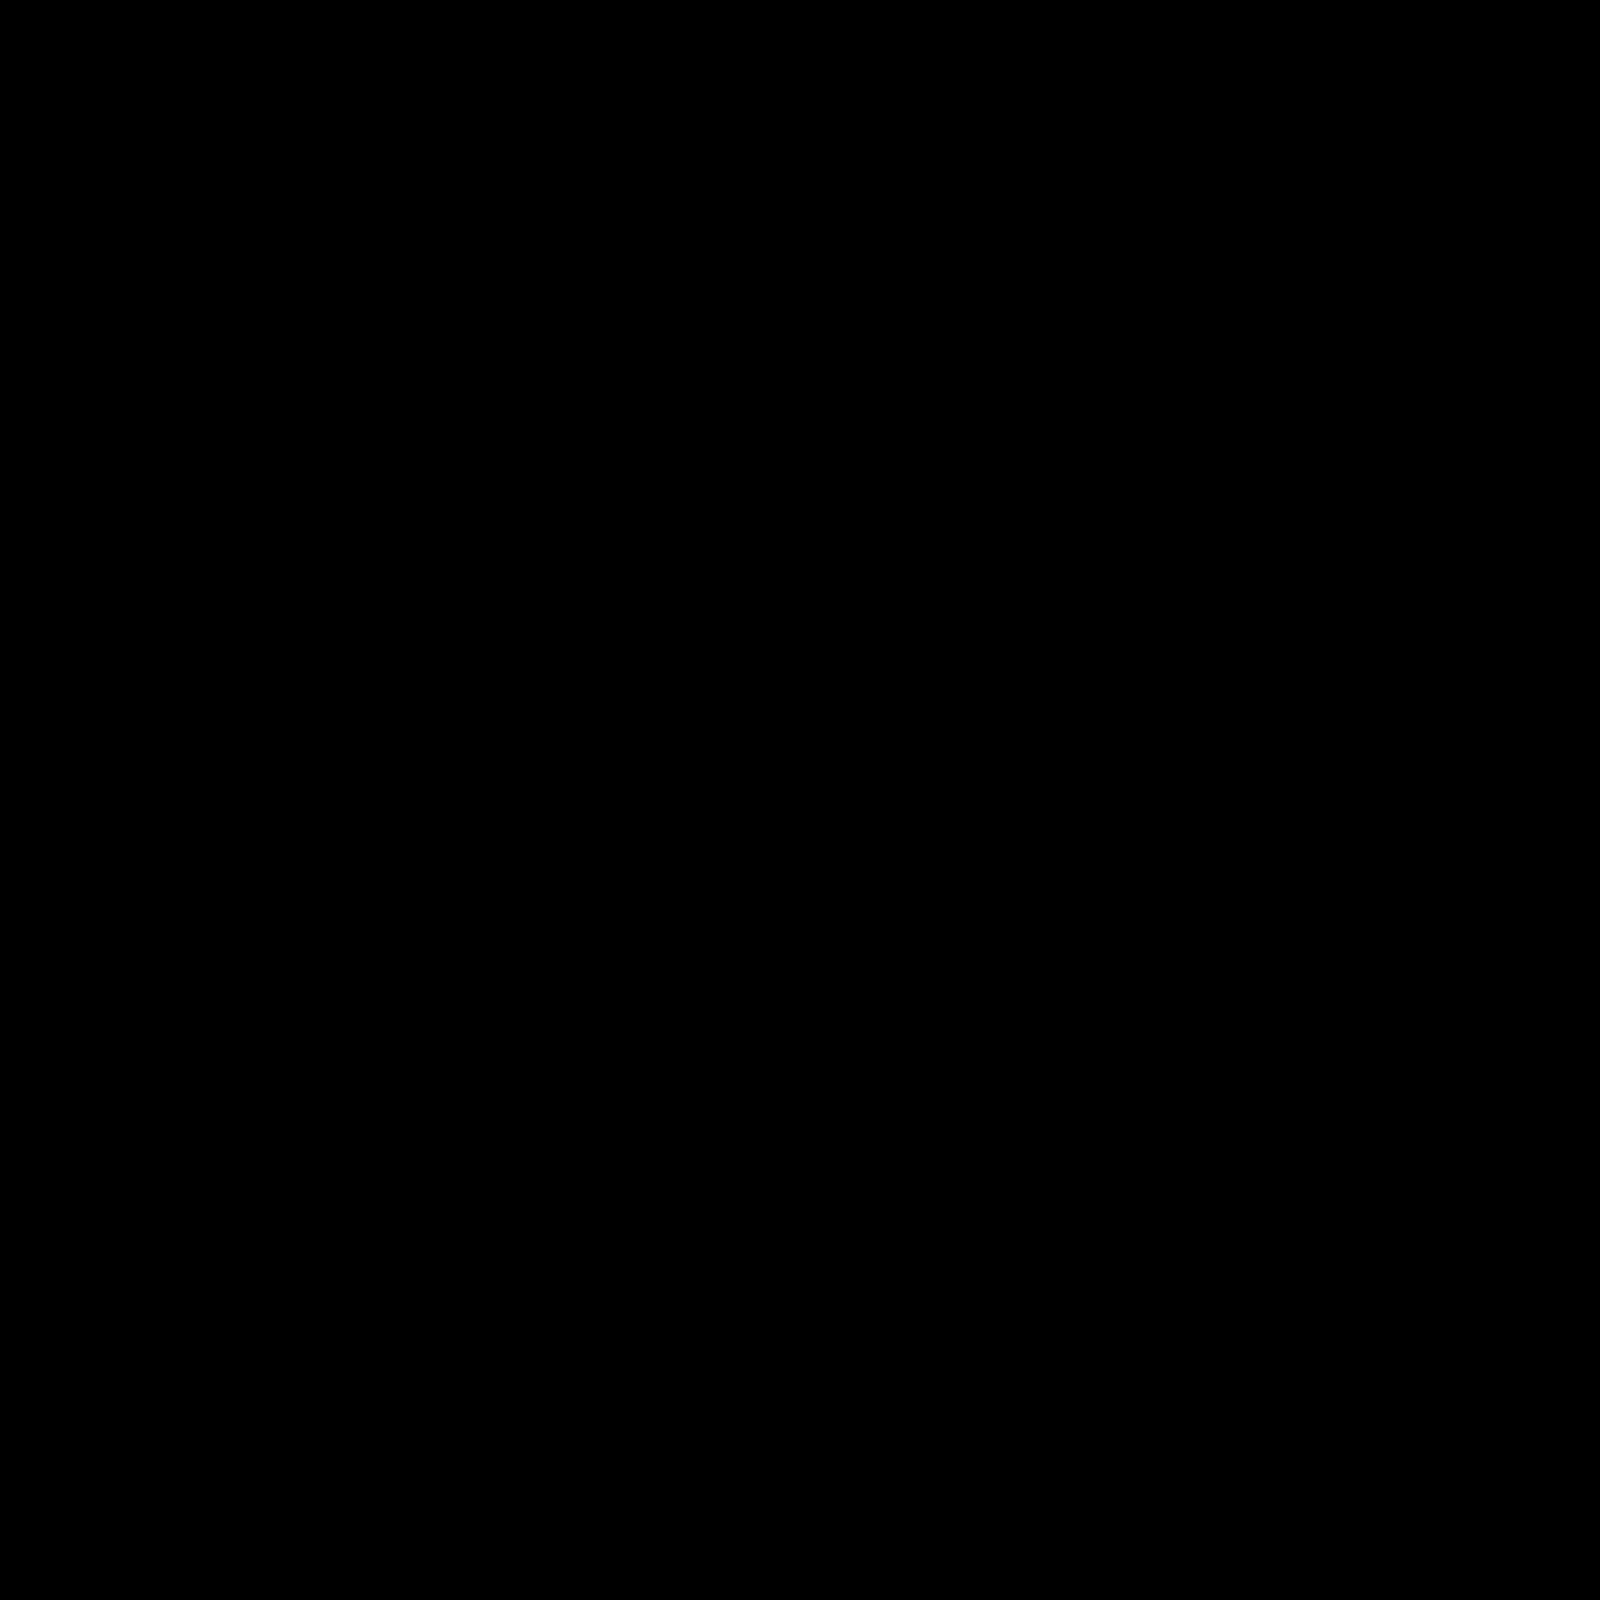 Ambulance Filled icon